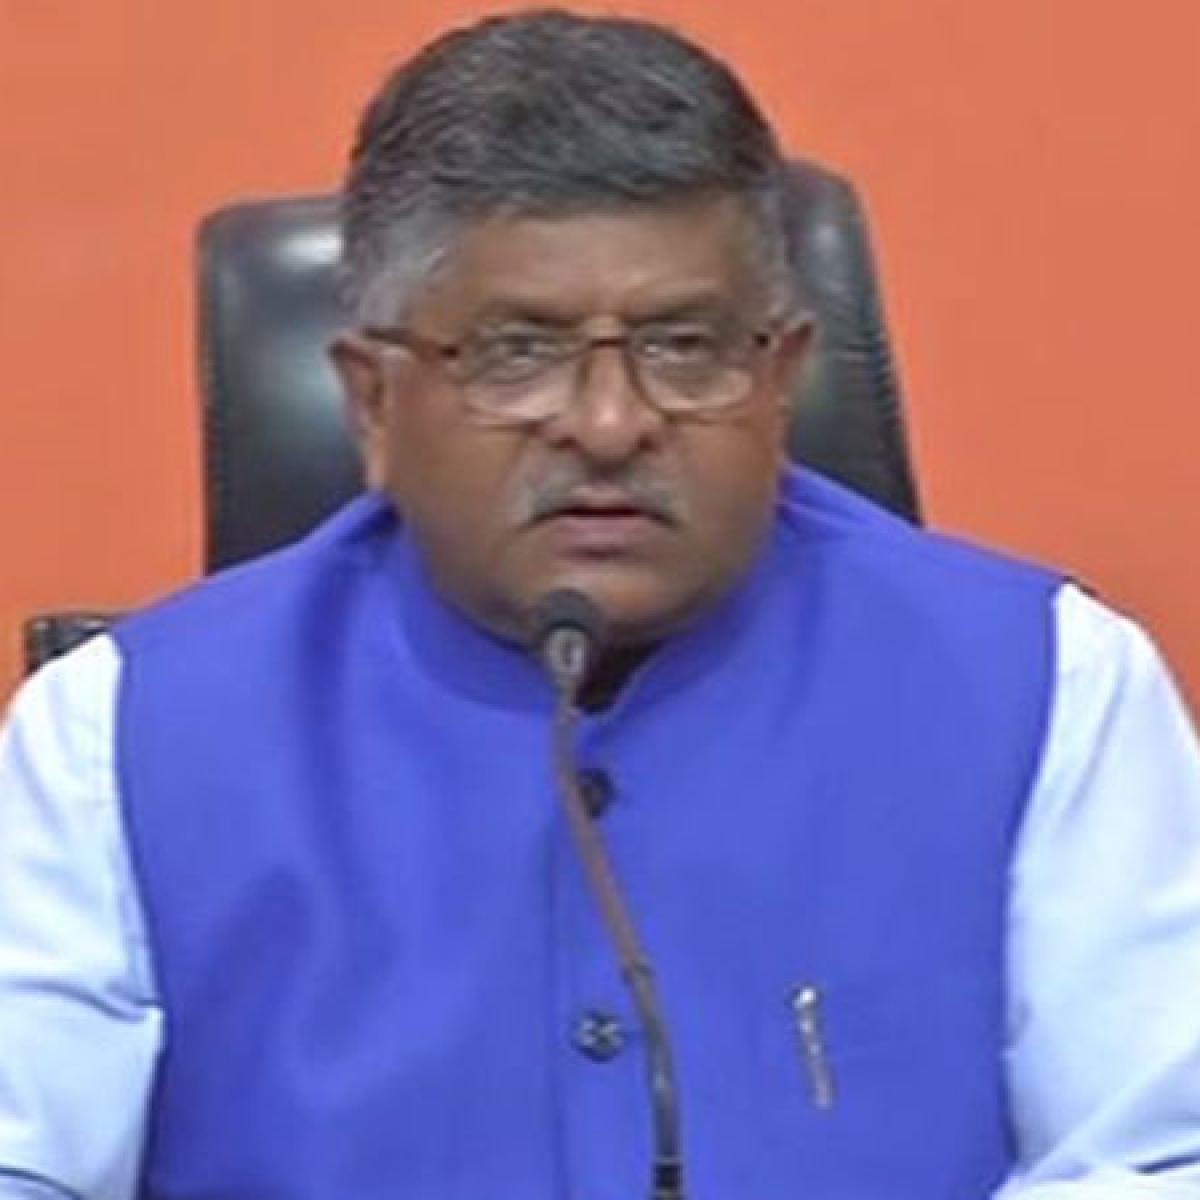 Rahul Gandhi is weakening Coronavirus fight, says Union Law and Telecom Minister Ravi Shankar Prasad